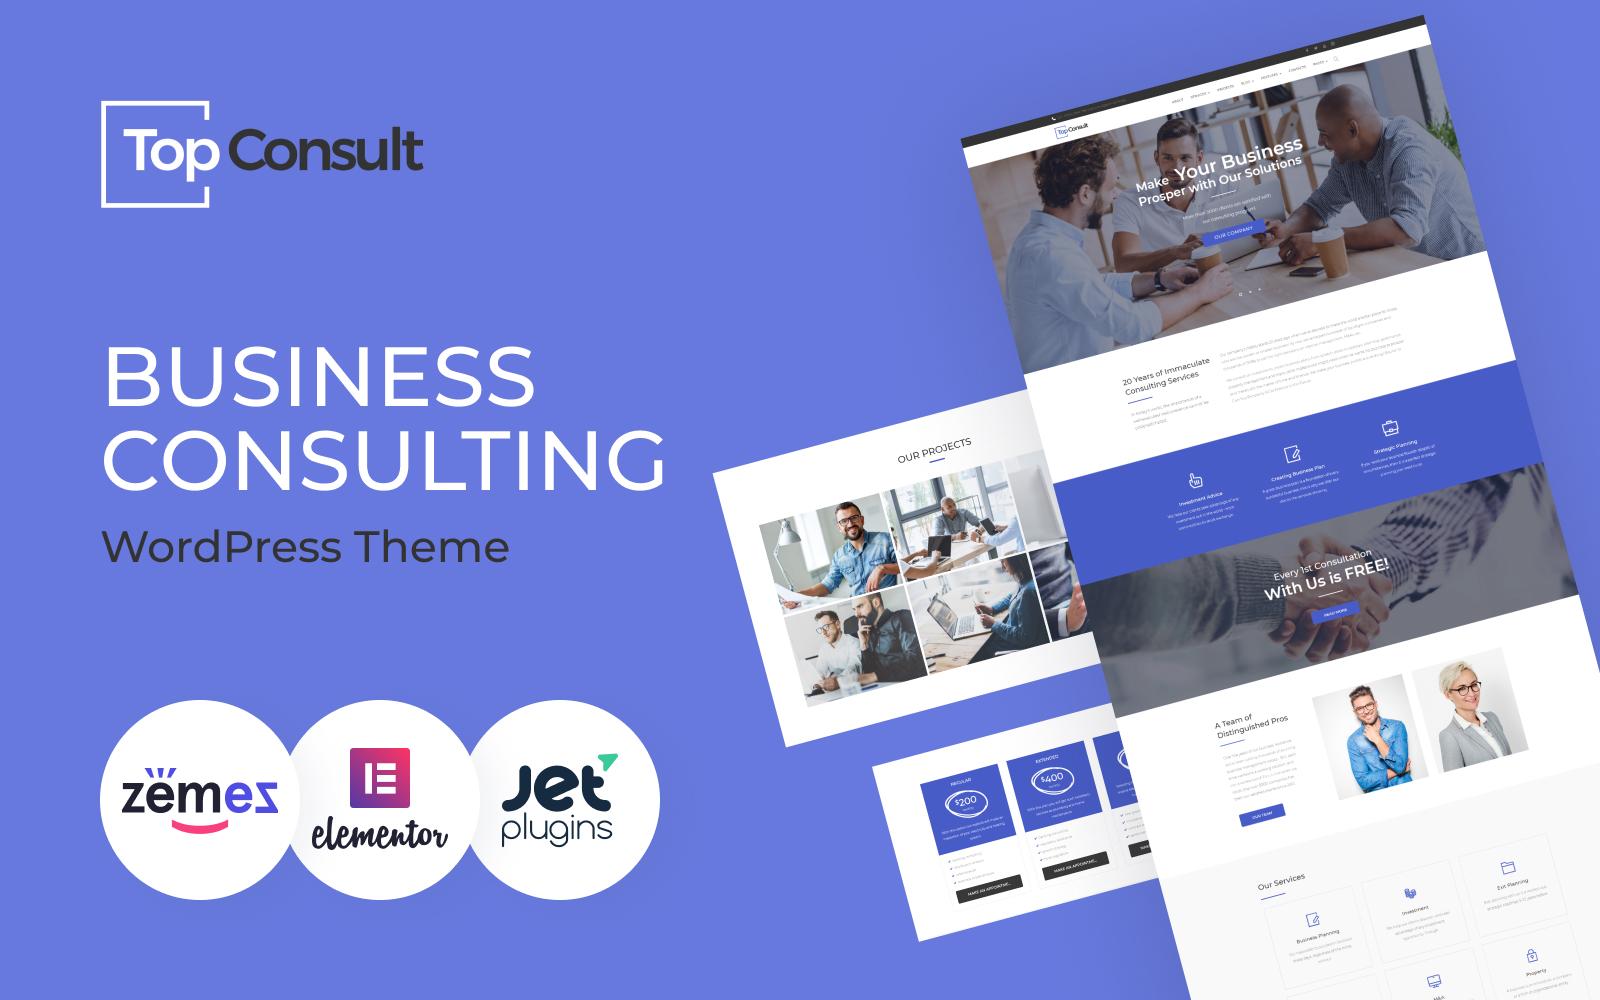 """TopConsult - Business Consulting WordPress Theme"" 响应式WordPress模板 #65484"